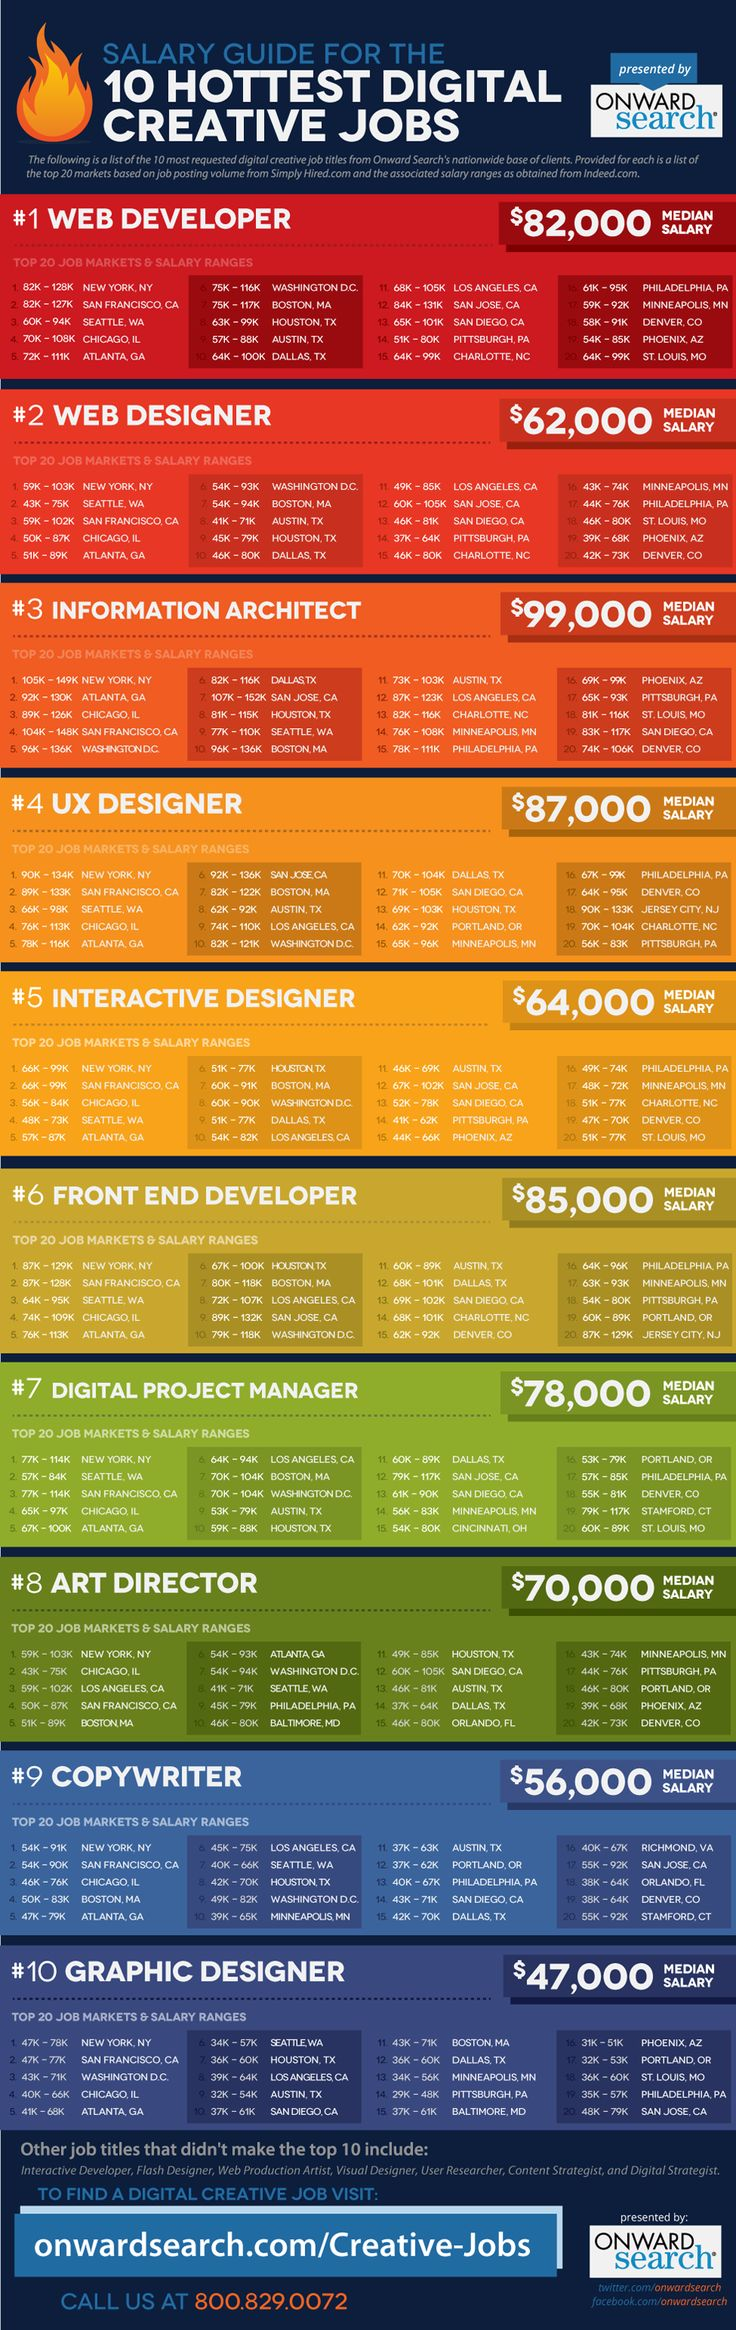 #Digital #creative careers salary guide (2012) #infographic